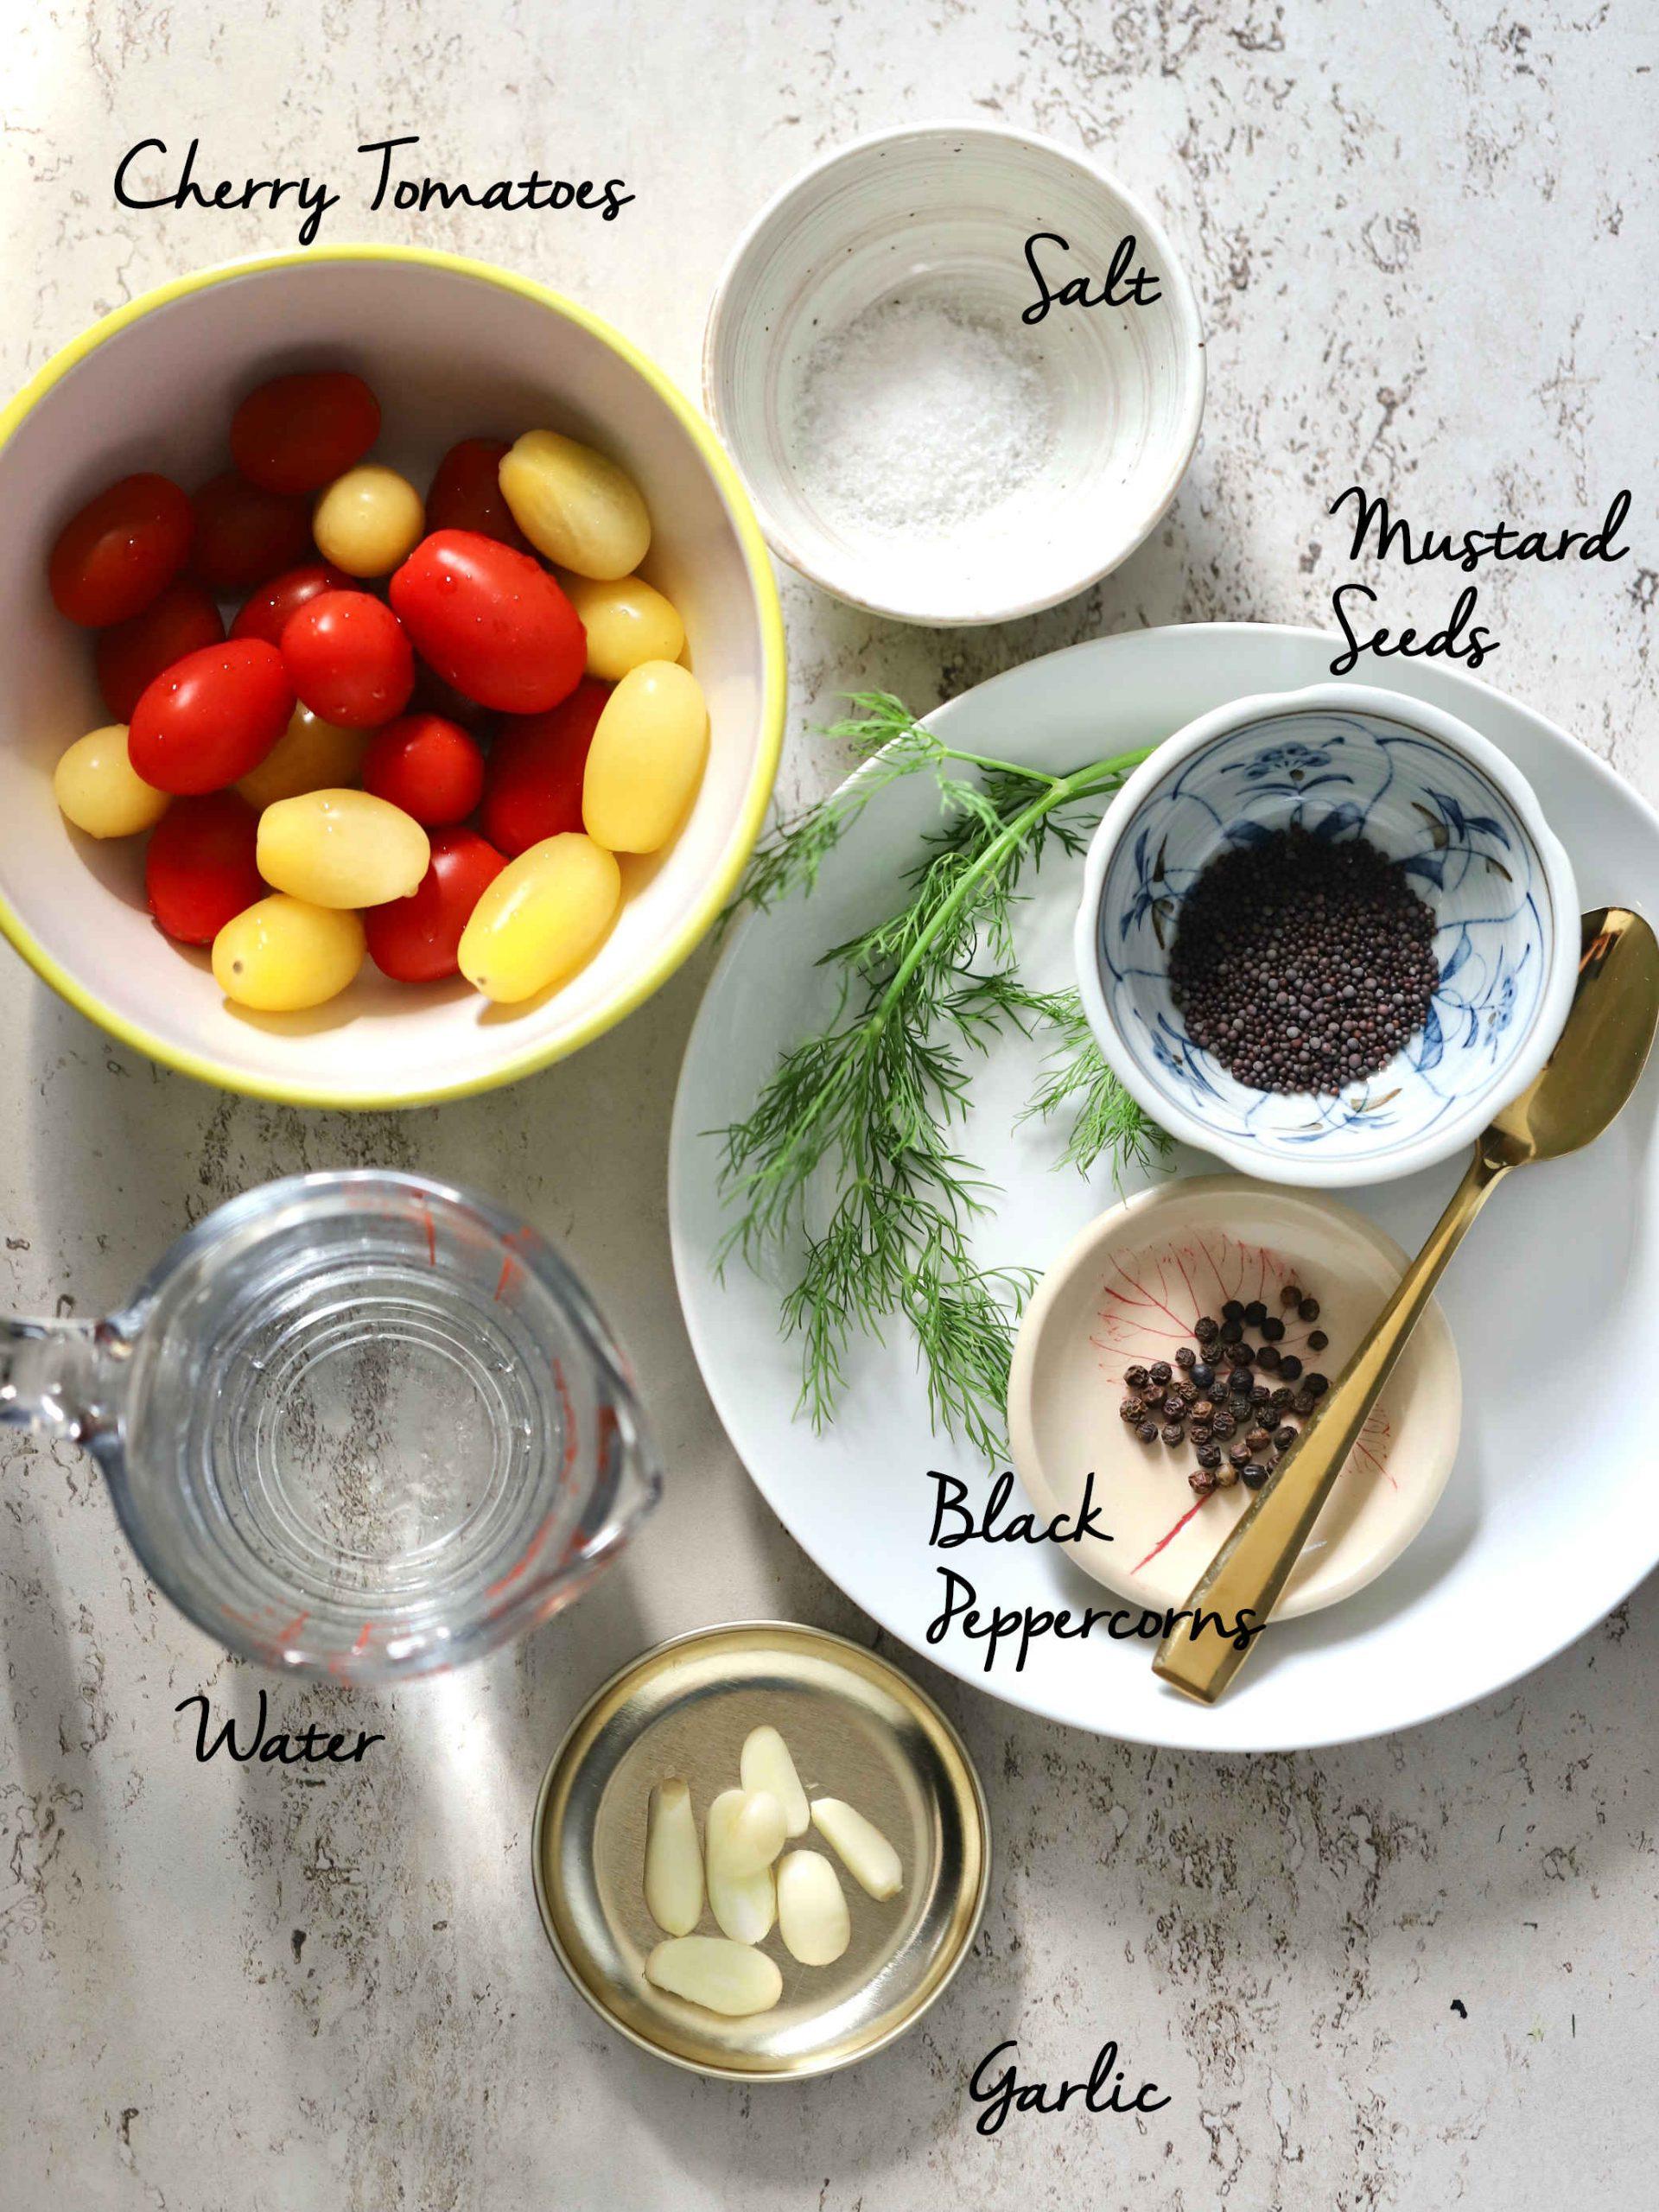 ingredients for this recipe: cherry tomatoes, salt, mustard seeds, black peppercorns, water, garlic